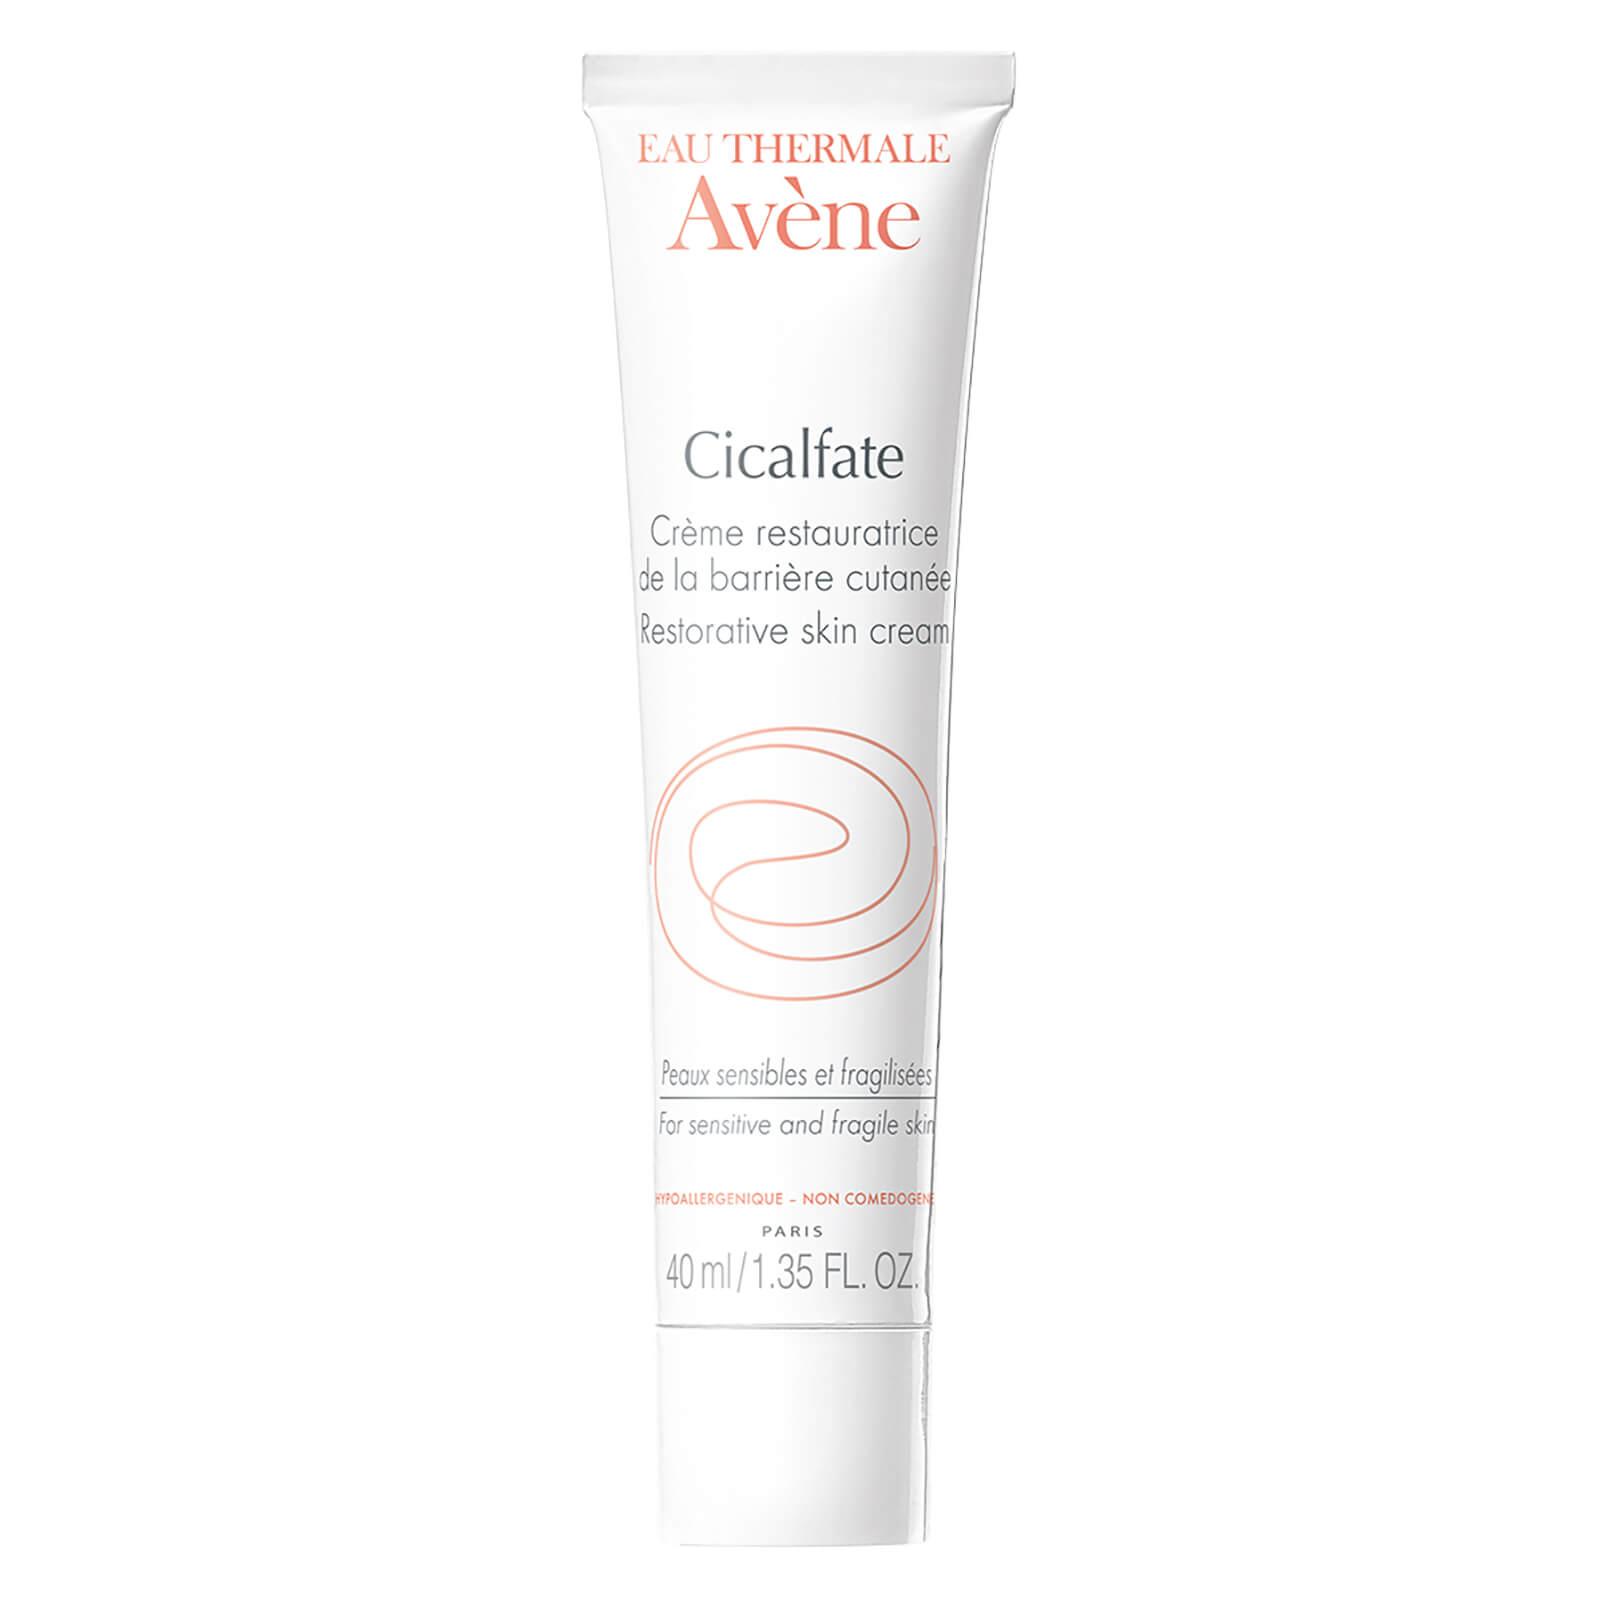 Купить Avène Cleanance Mask for Oily, Blemish-Prone Skin 50ml